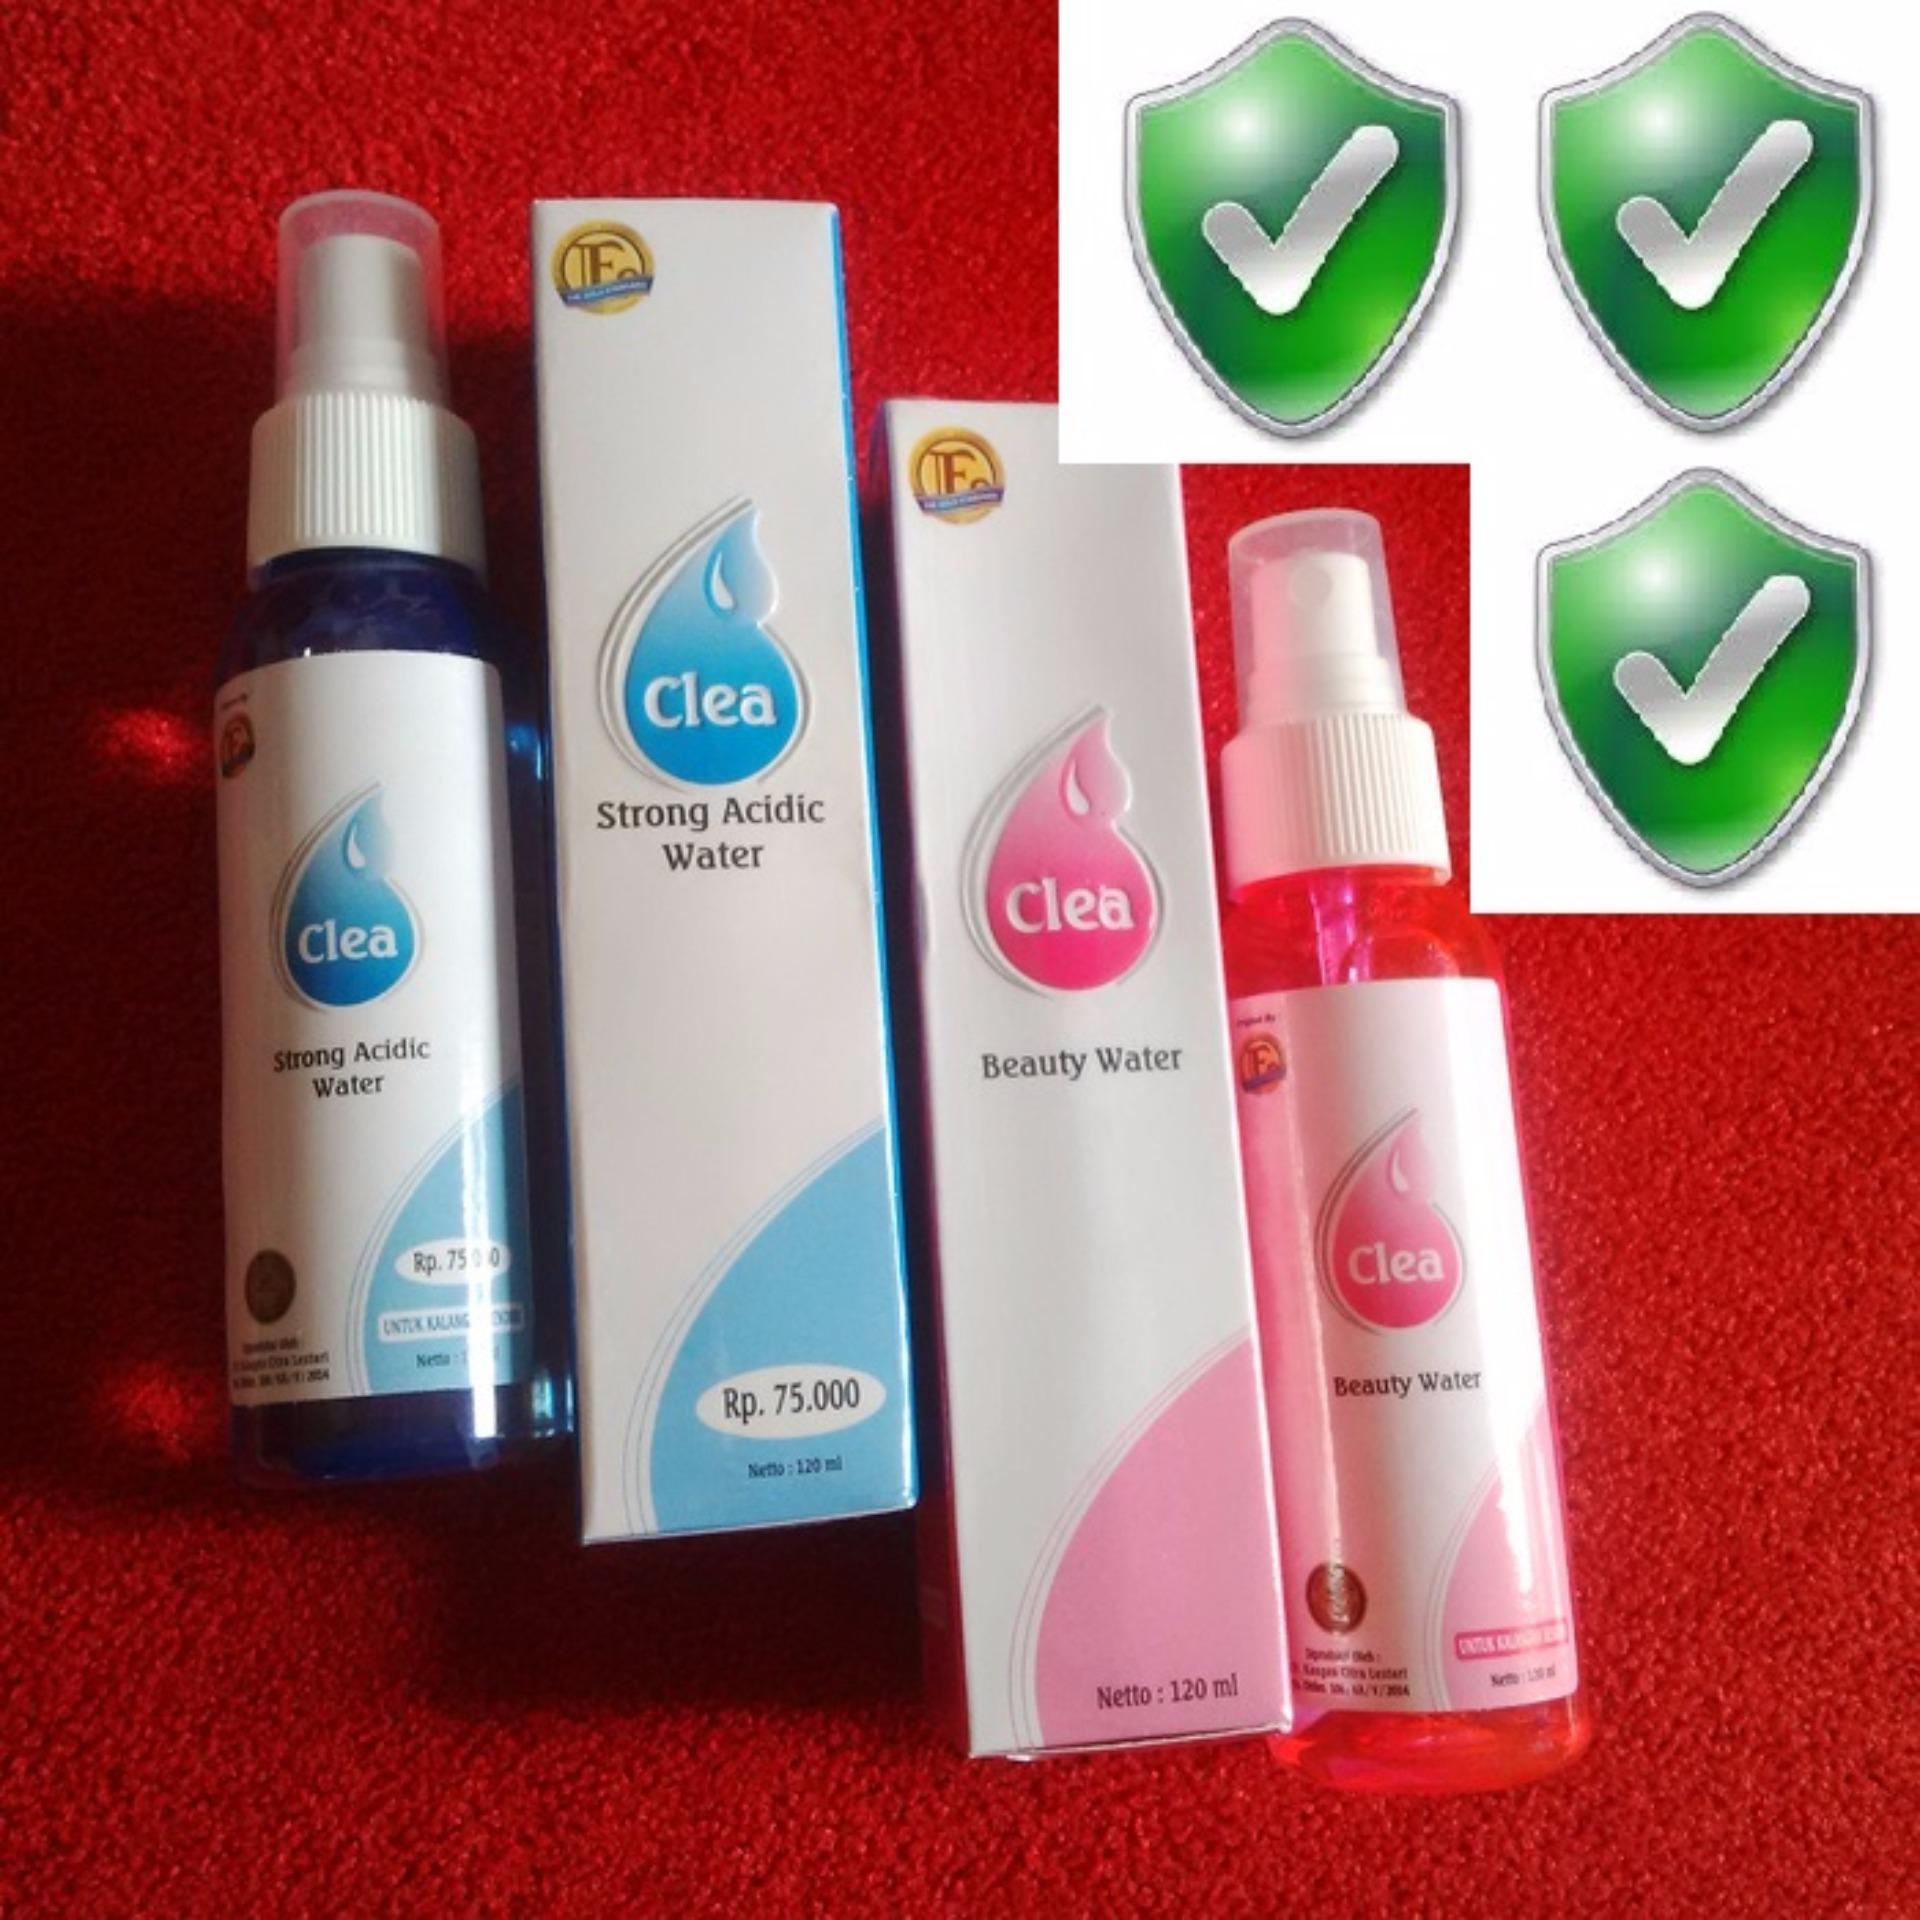 Beauty Water + Strong Acid 1 paket 120ml (Box + Segel)